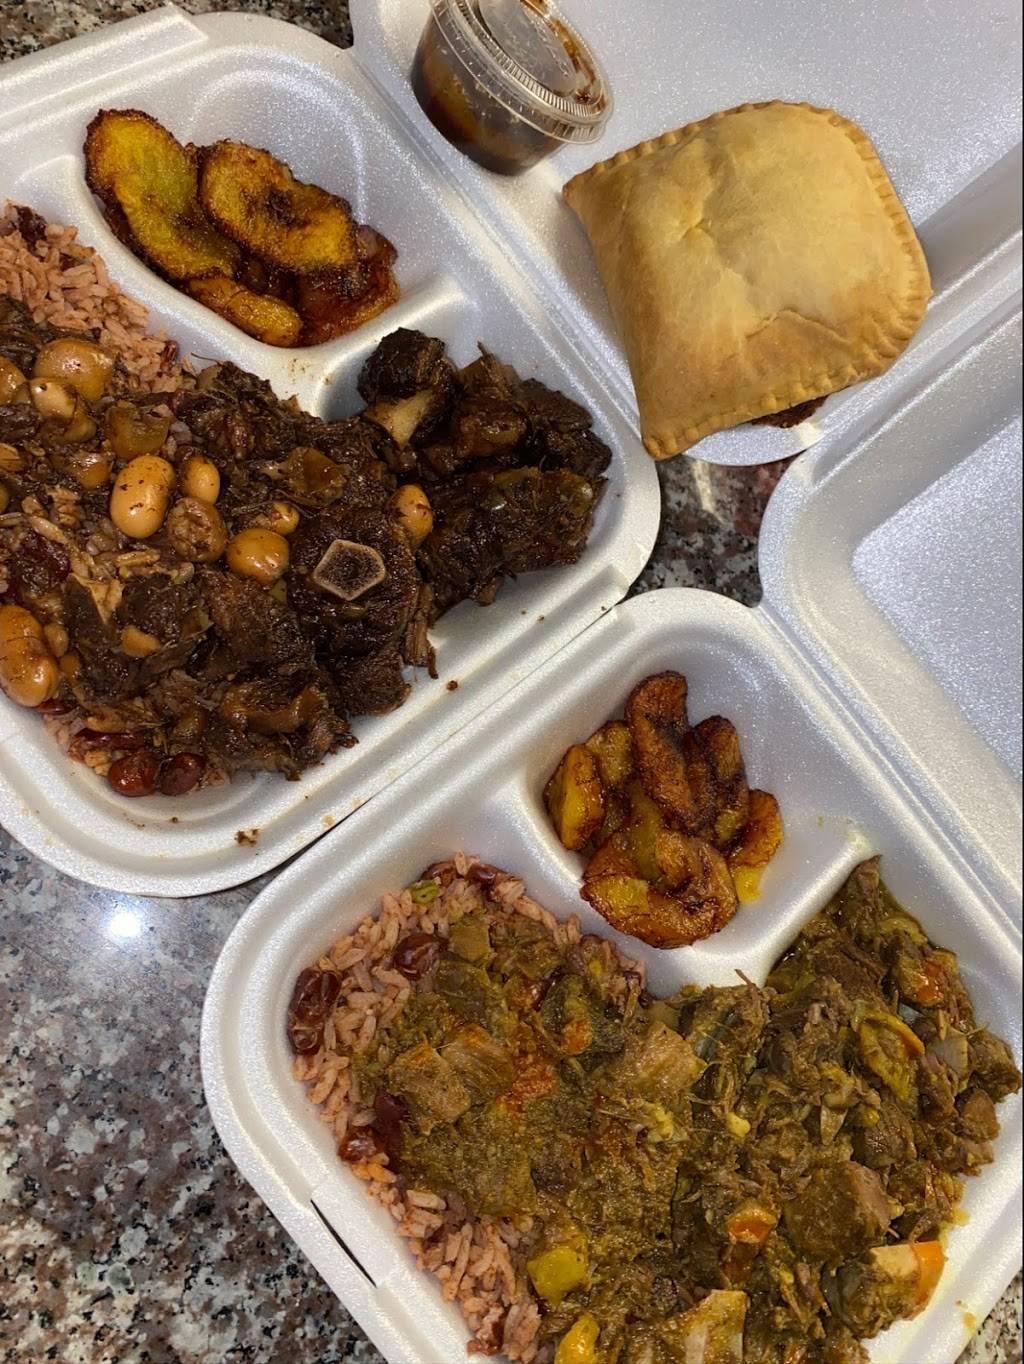 Ocho Rios Jamaican Restaurant   restaurant   4290 S Hwy 27, Clermont, FL 34711, USA   3524325624 OR +1 352-432-5624